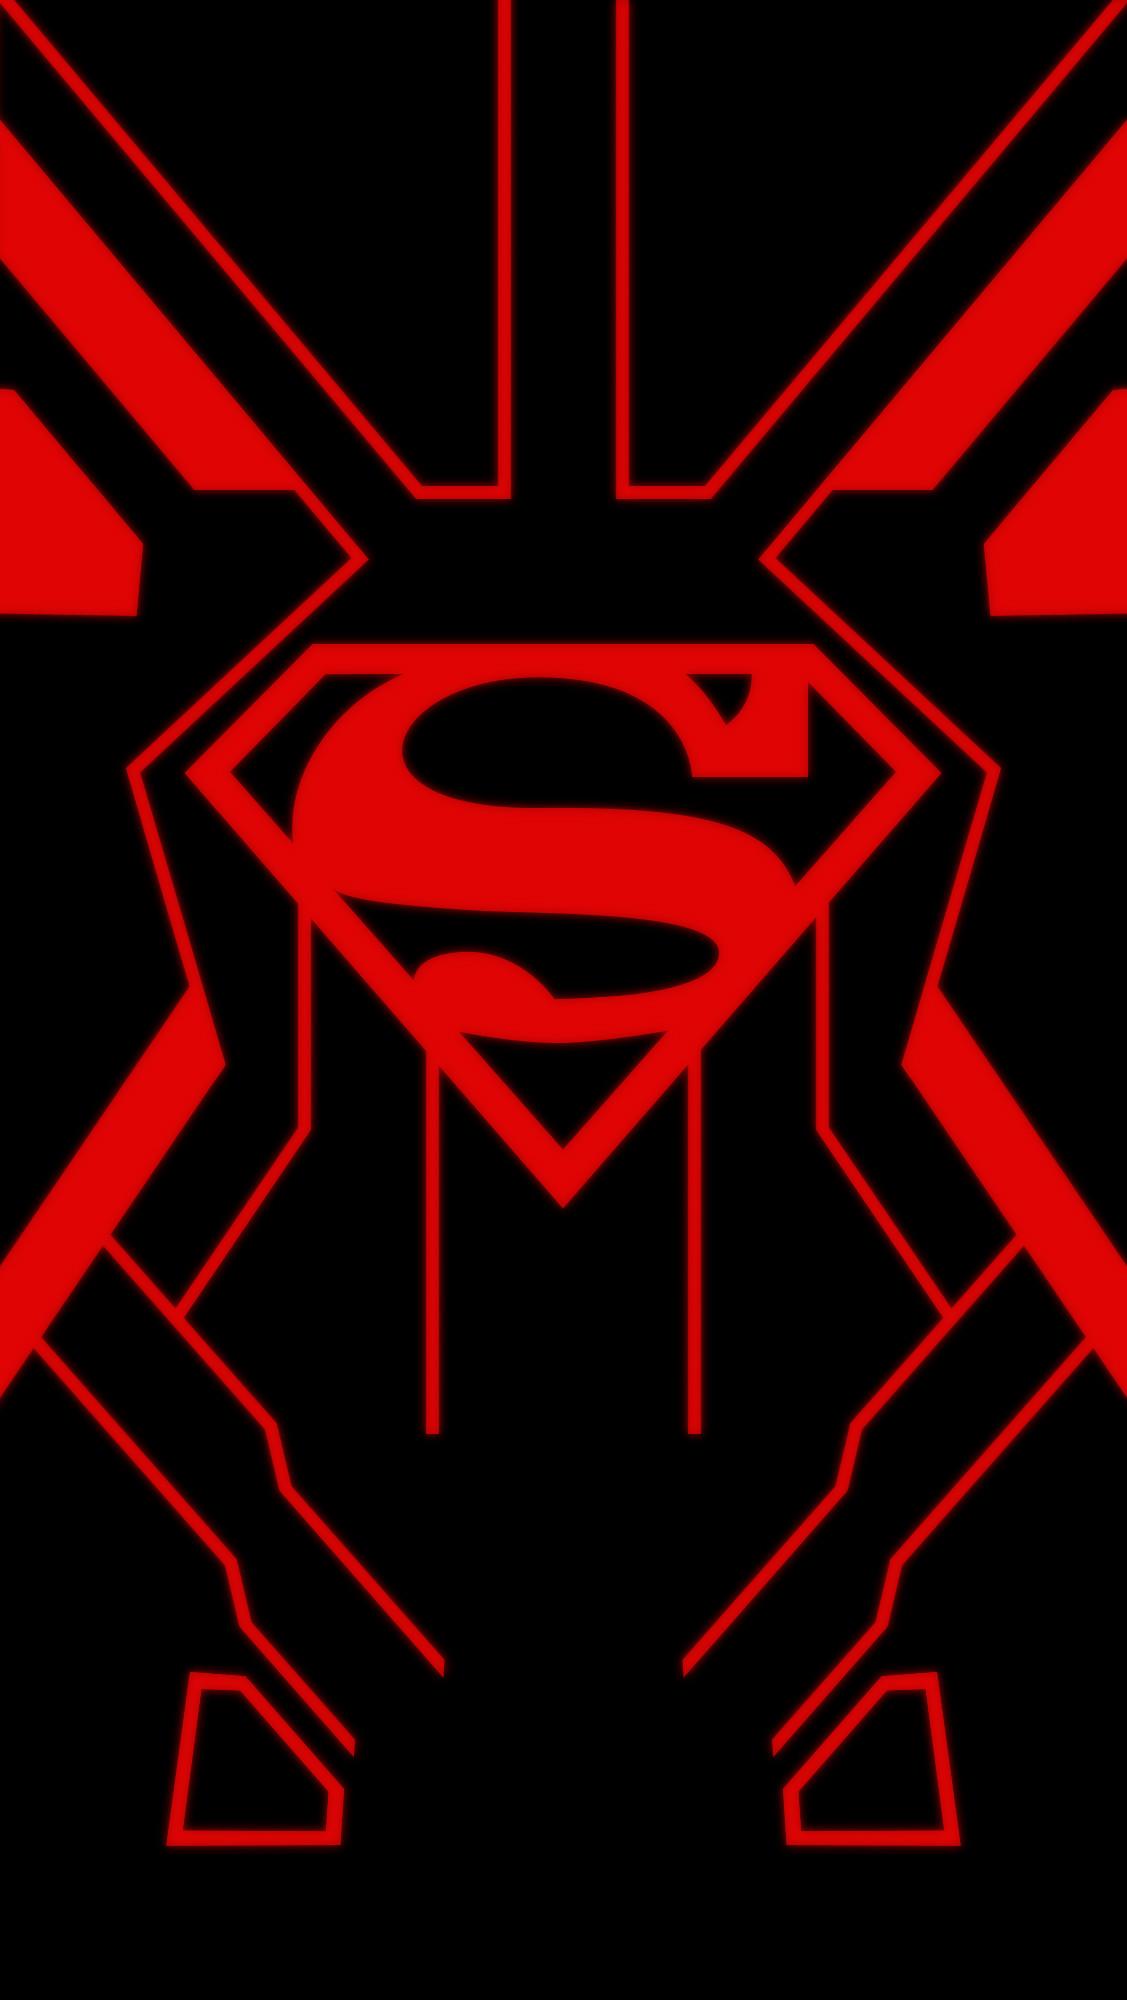 Superman iPhone Wallpaper HD 71 images 1127x2000